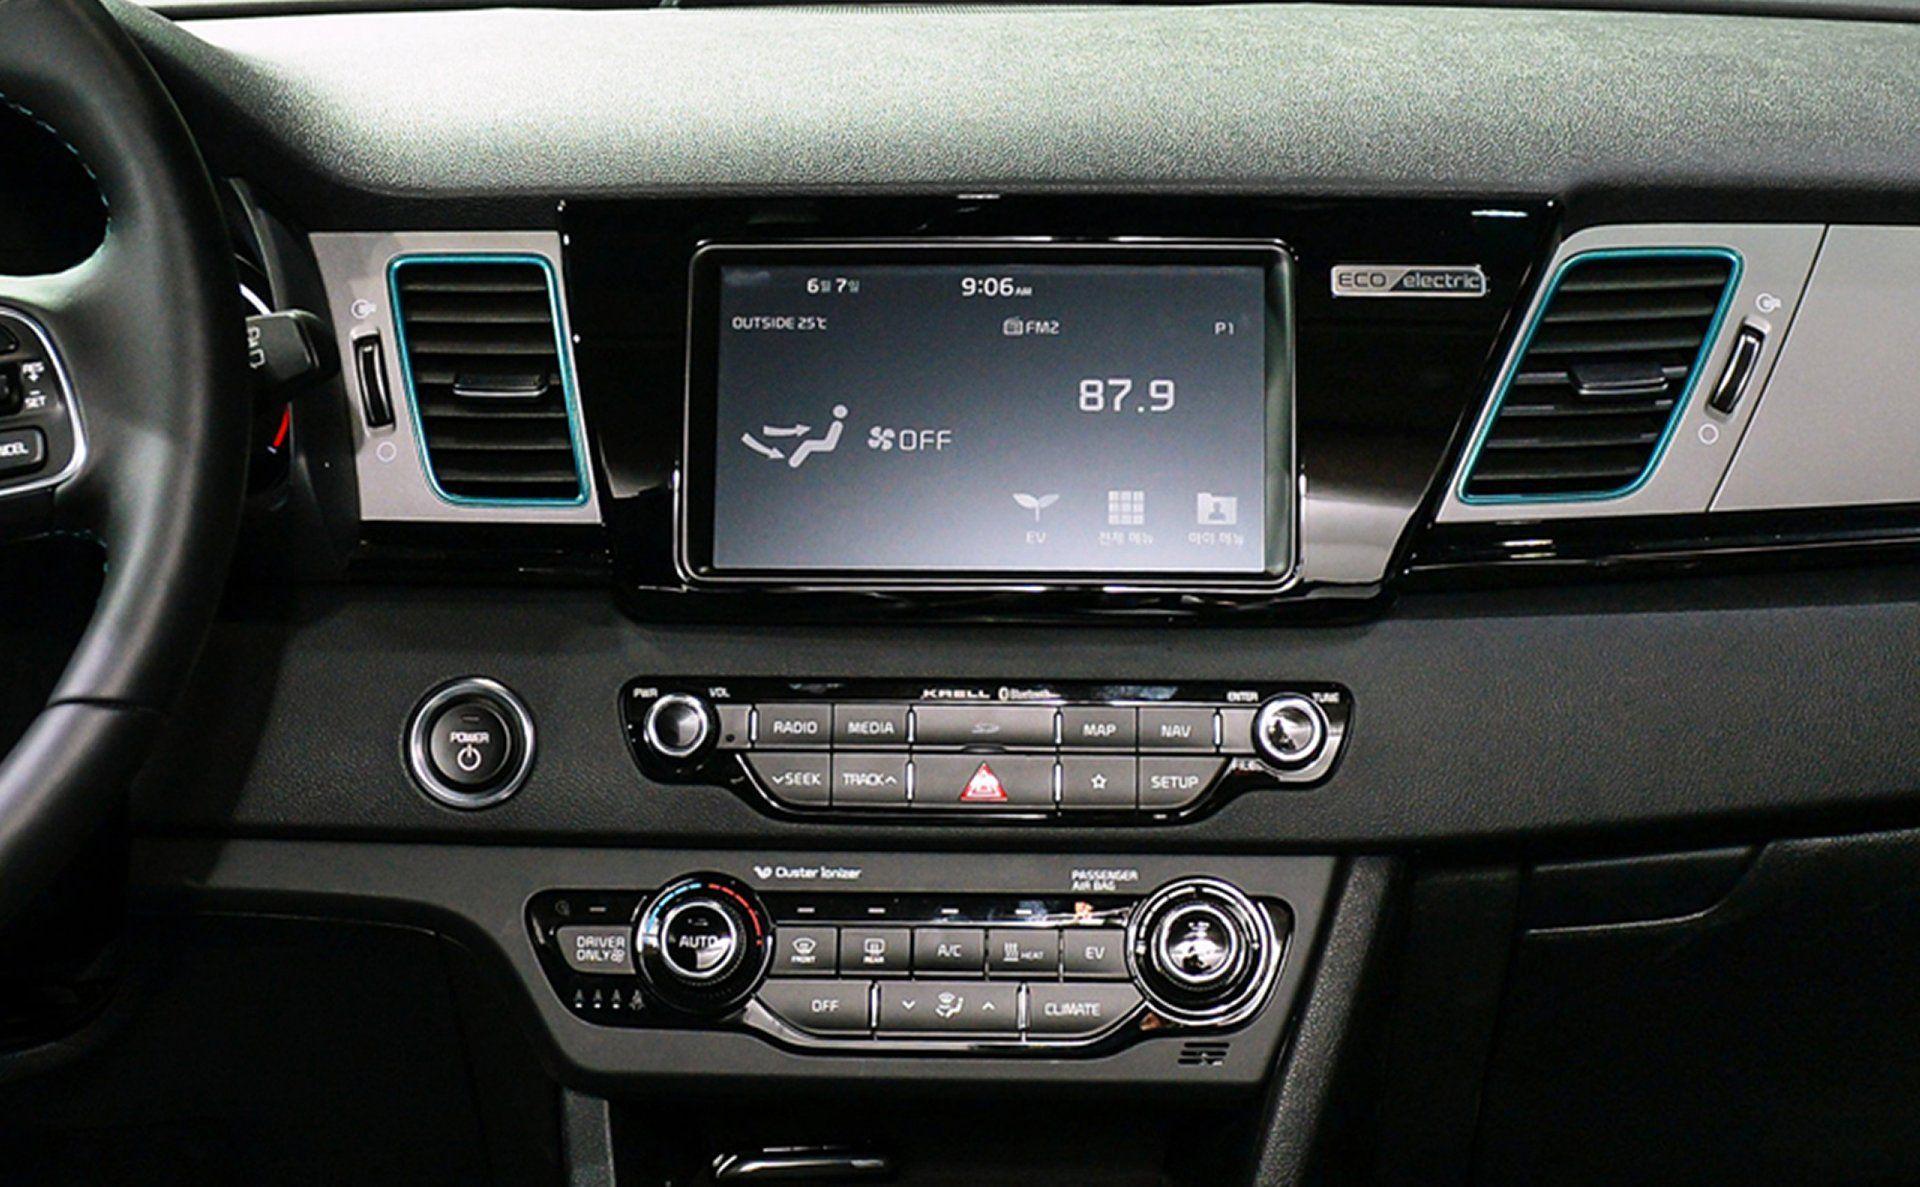 2019 Niro Ev Interior System Kia Driving Test Infotainment System